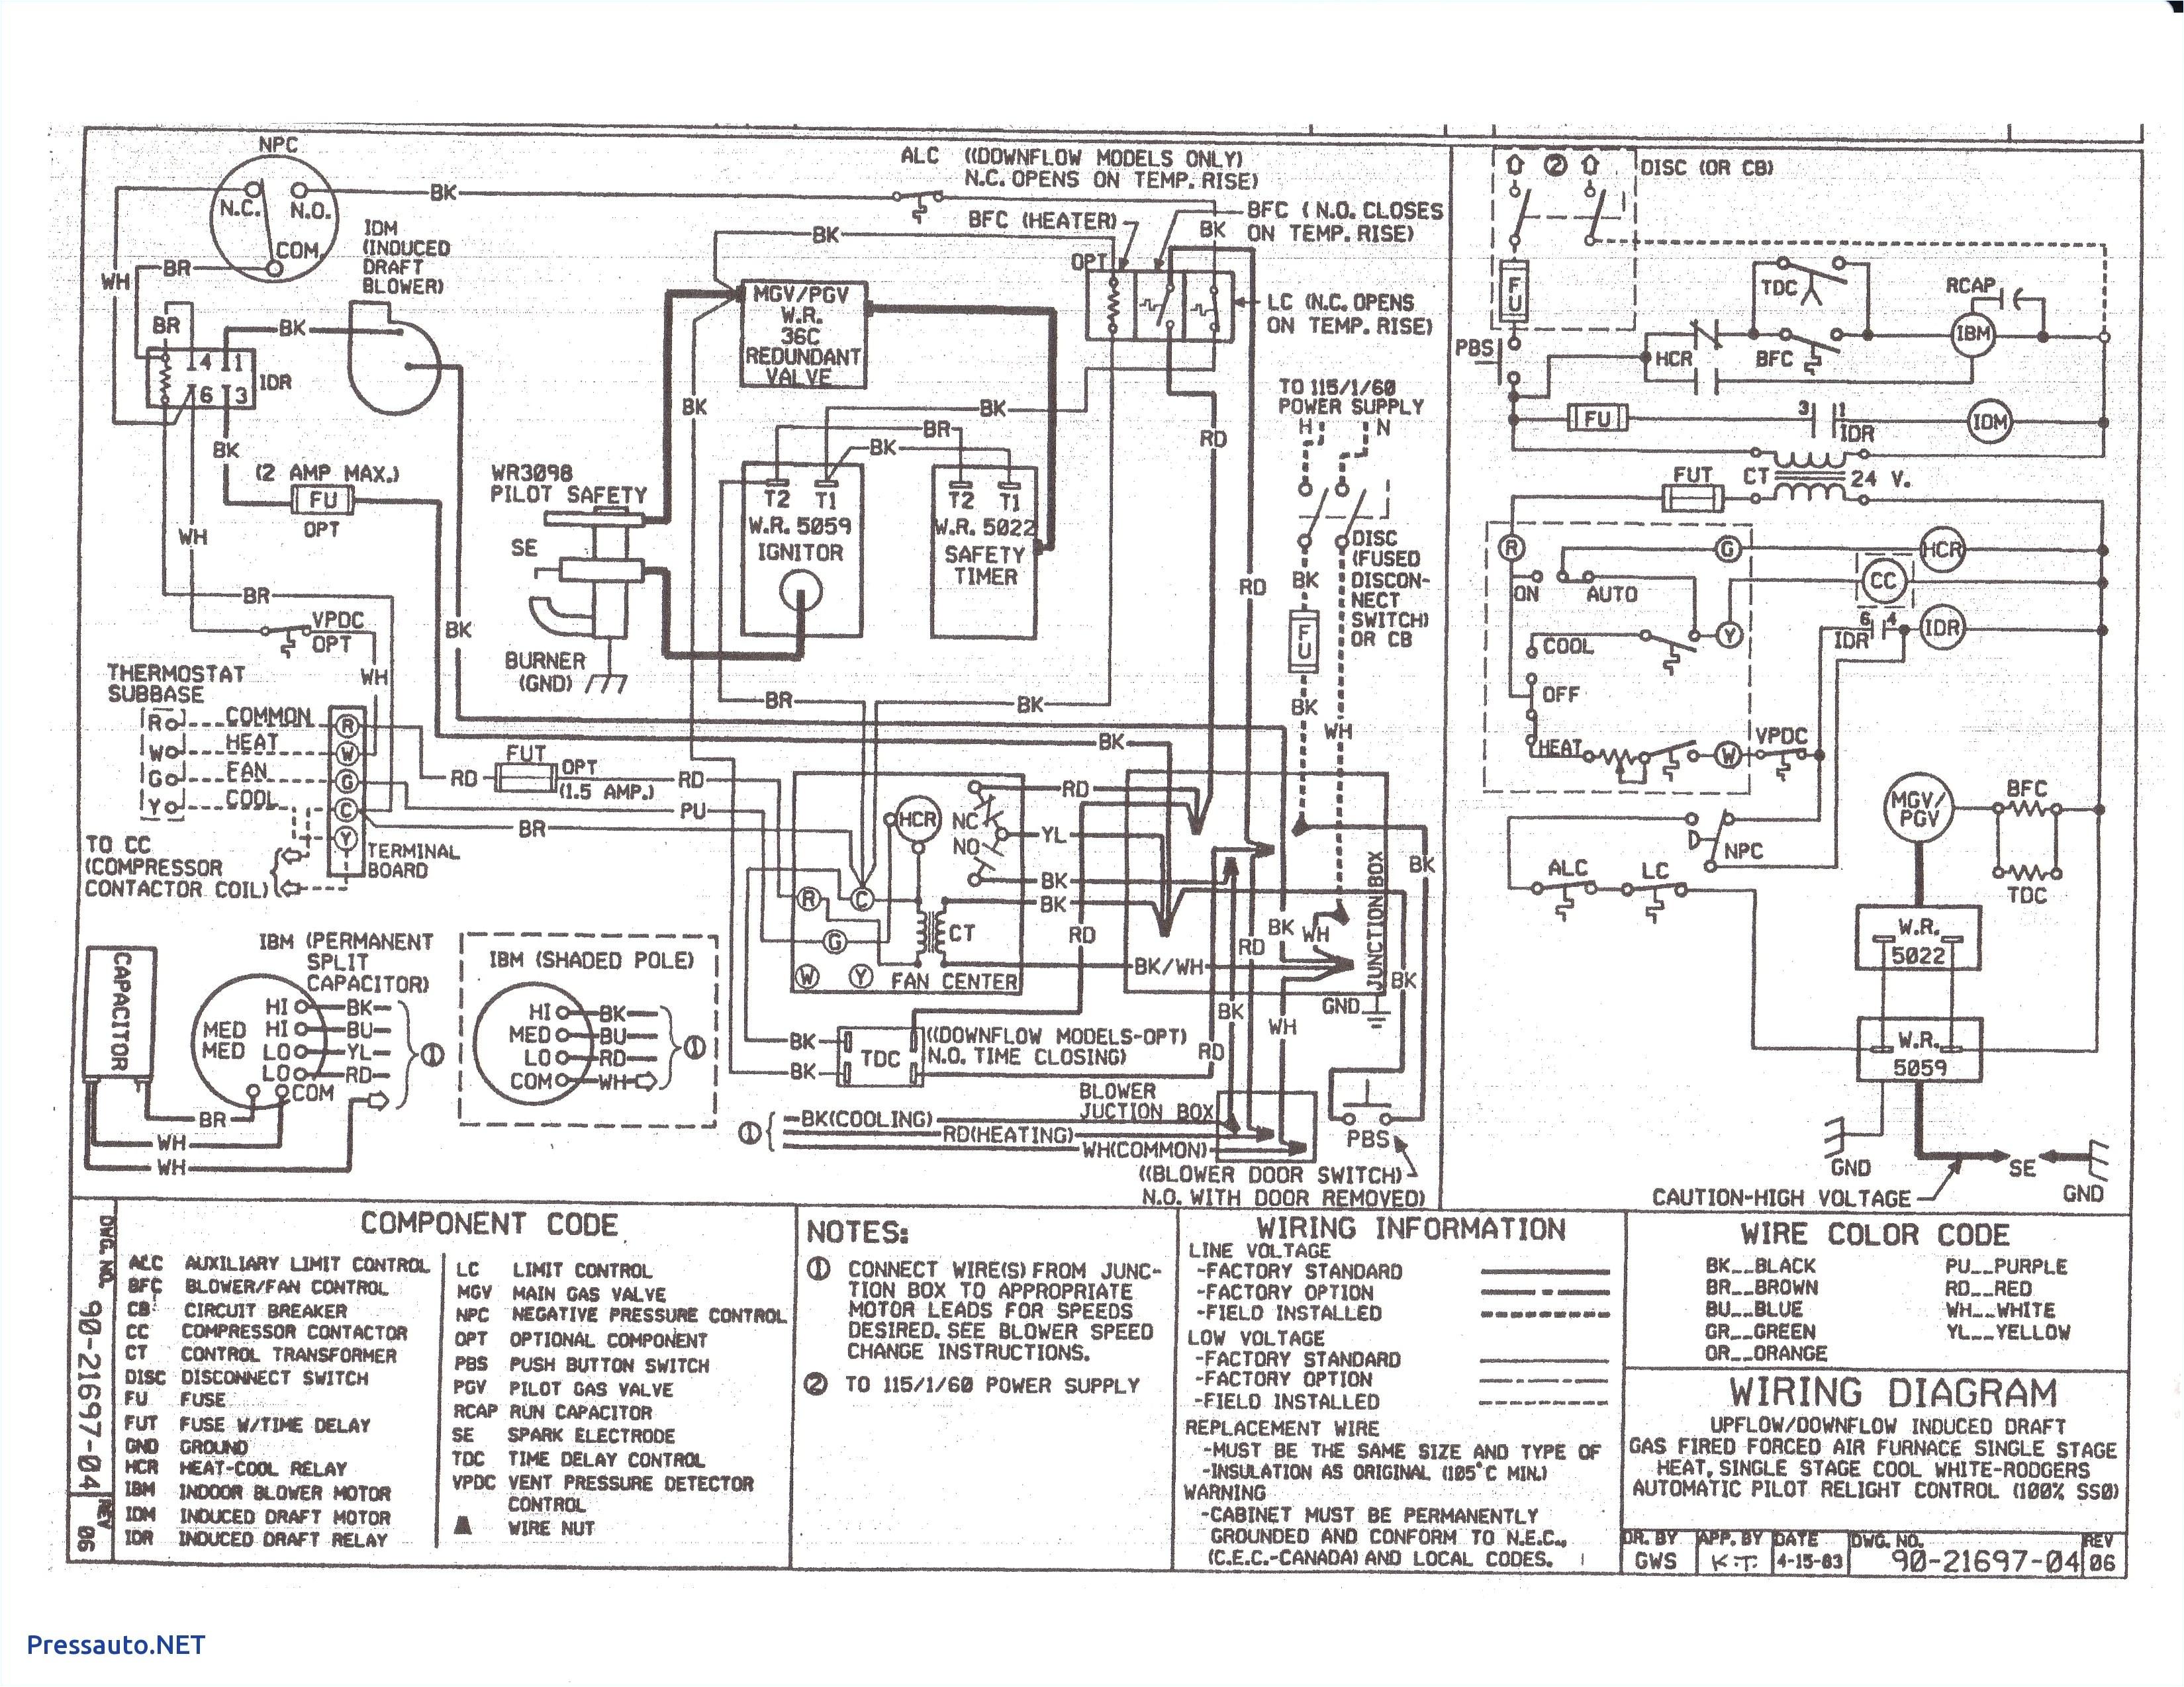 Electric Furnace Wiring Diagram Trane Electric Furnace Wiring Diagram Wiring Diagram Inside